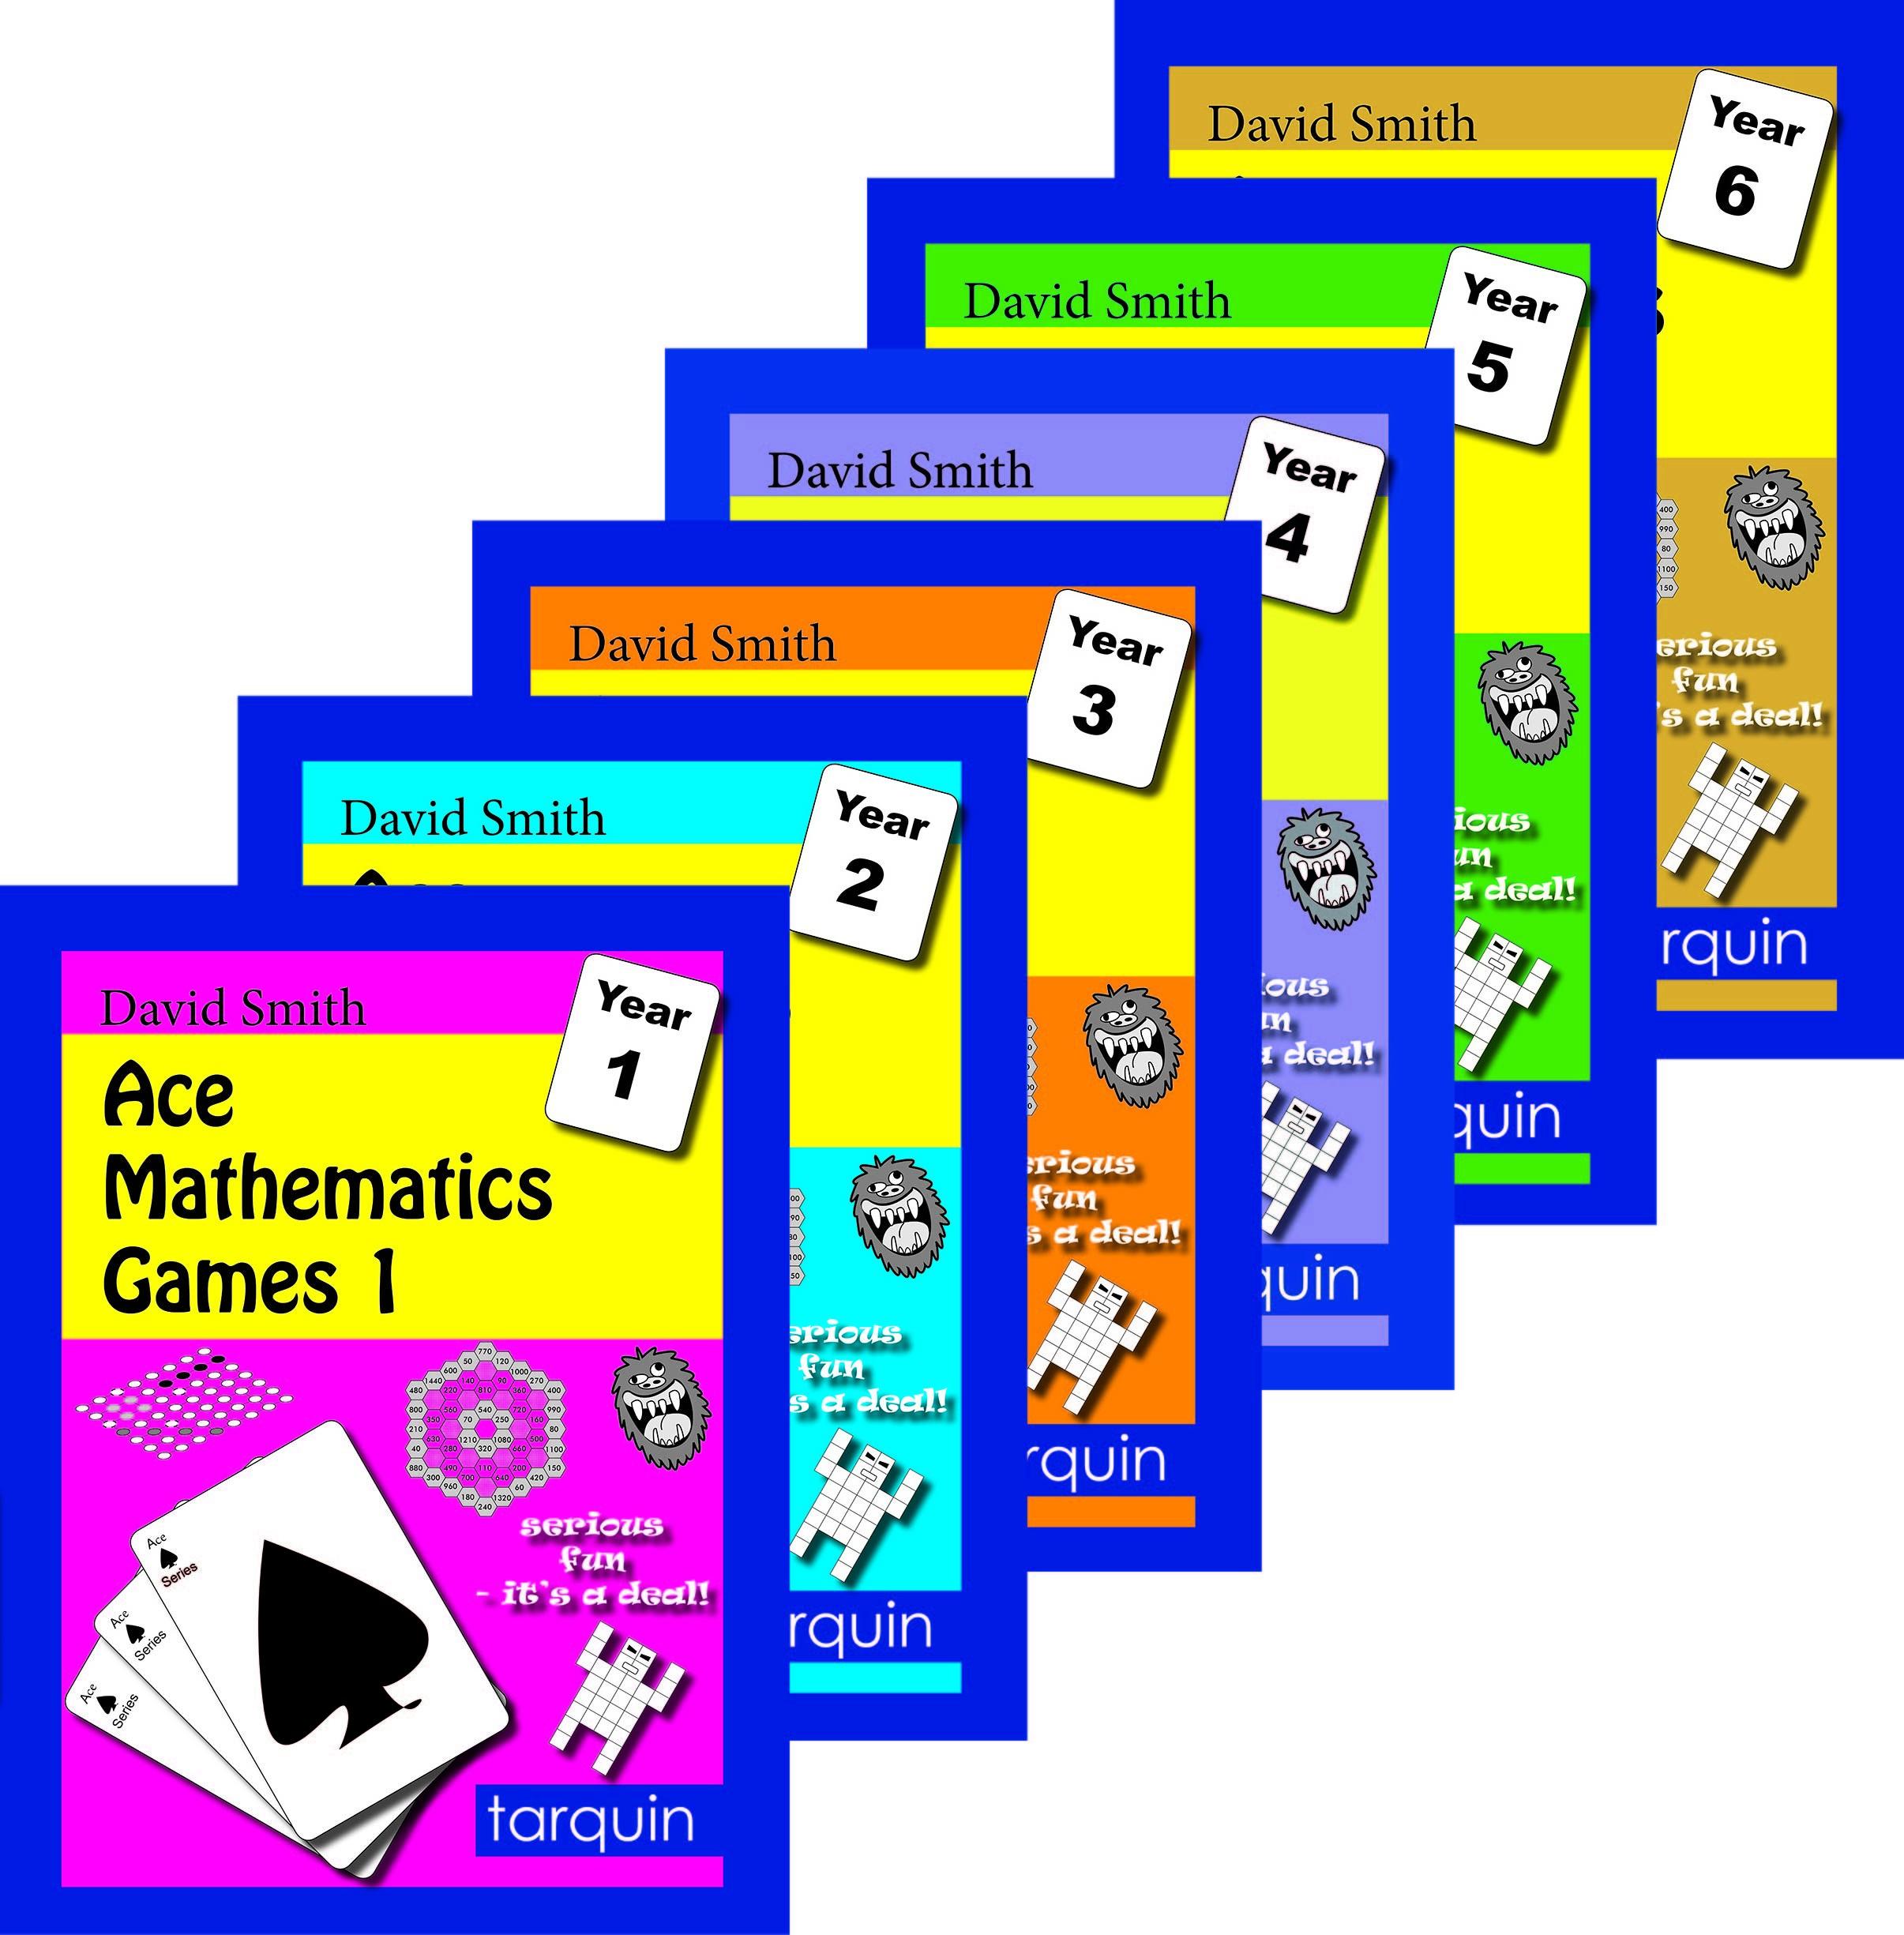 Ace Mathematics Games - Set of 6 - Tarquin Group